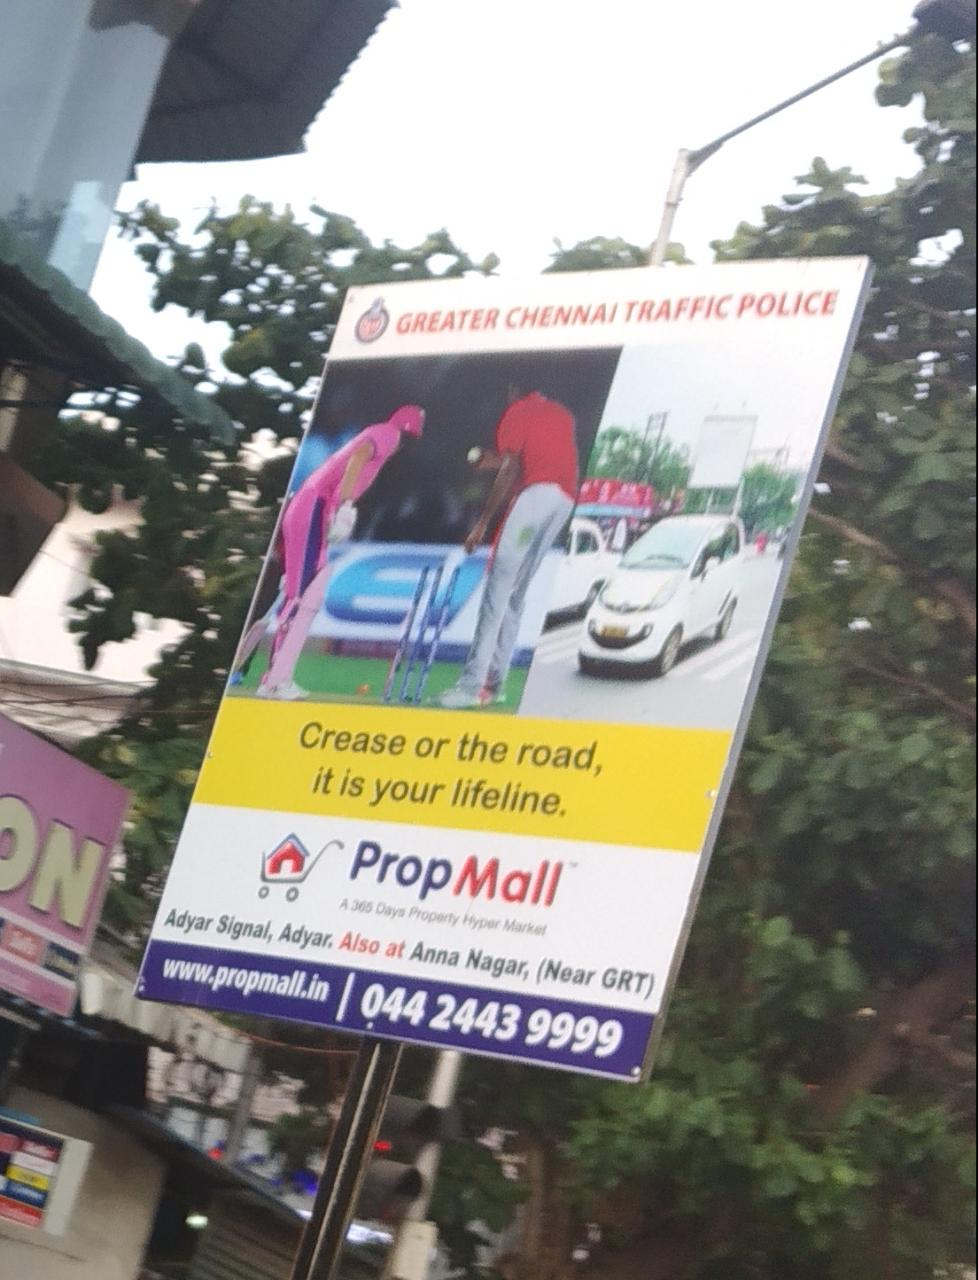 Greater Chennai Traffic Police Lifeline